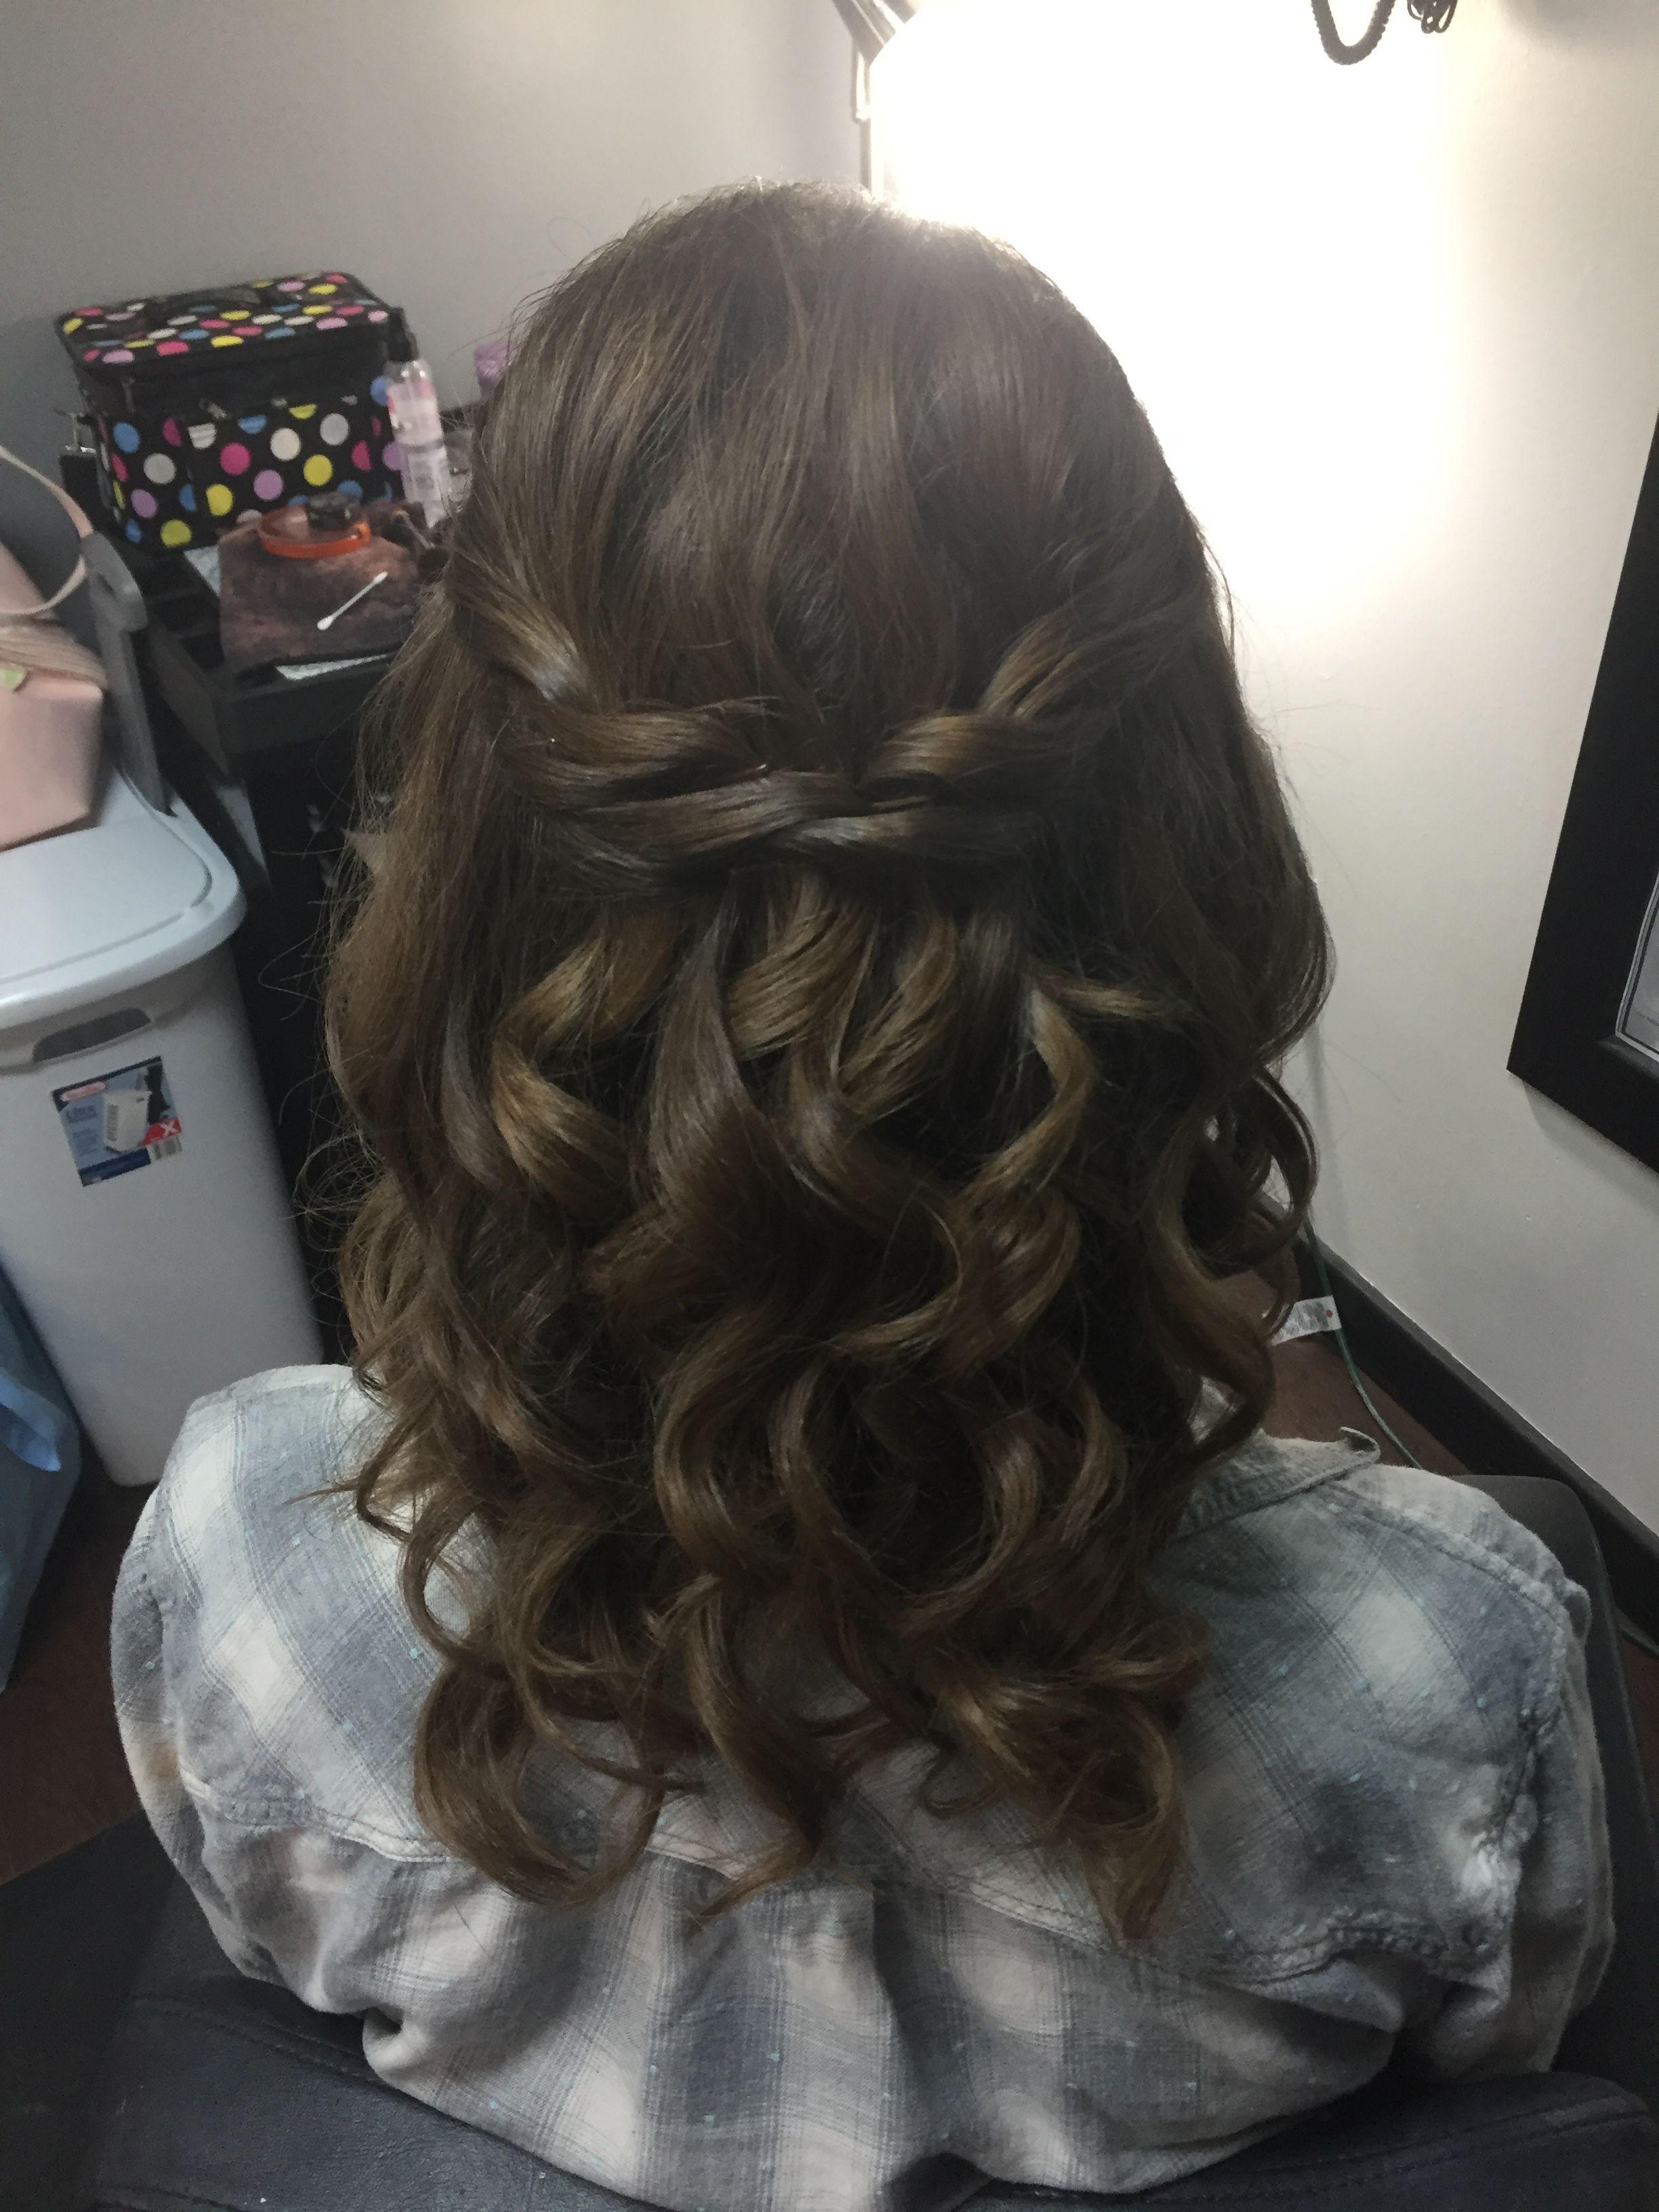 prom hair half up half down brunette hair braid curls updo